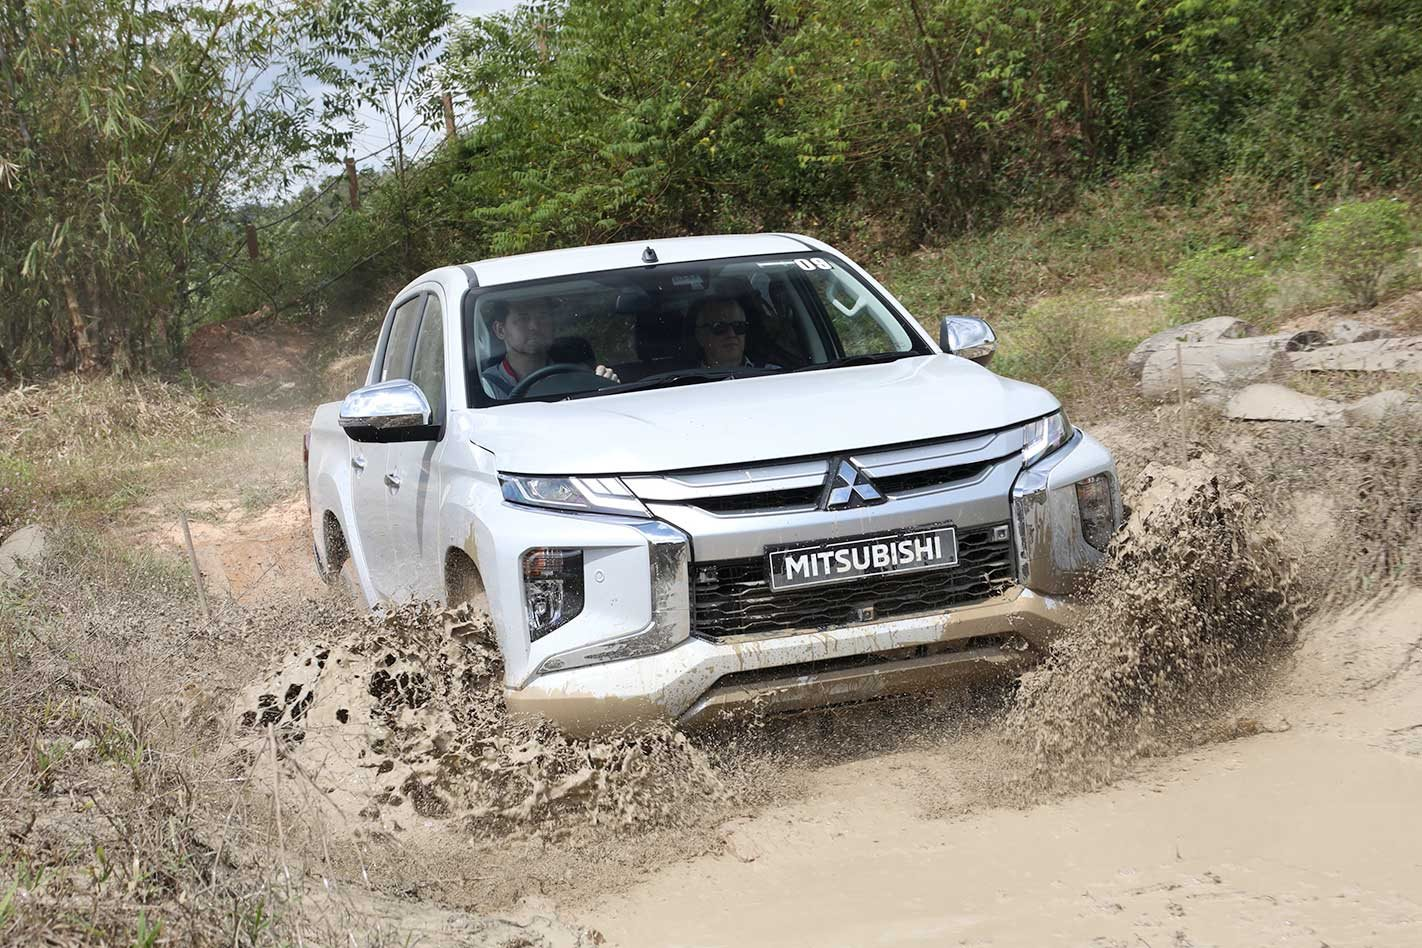 2019 Mitsubishi Triton first drive 4x4 review